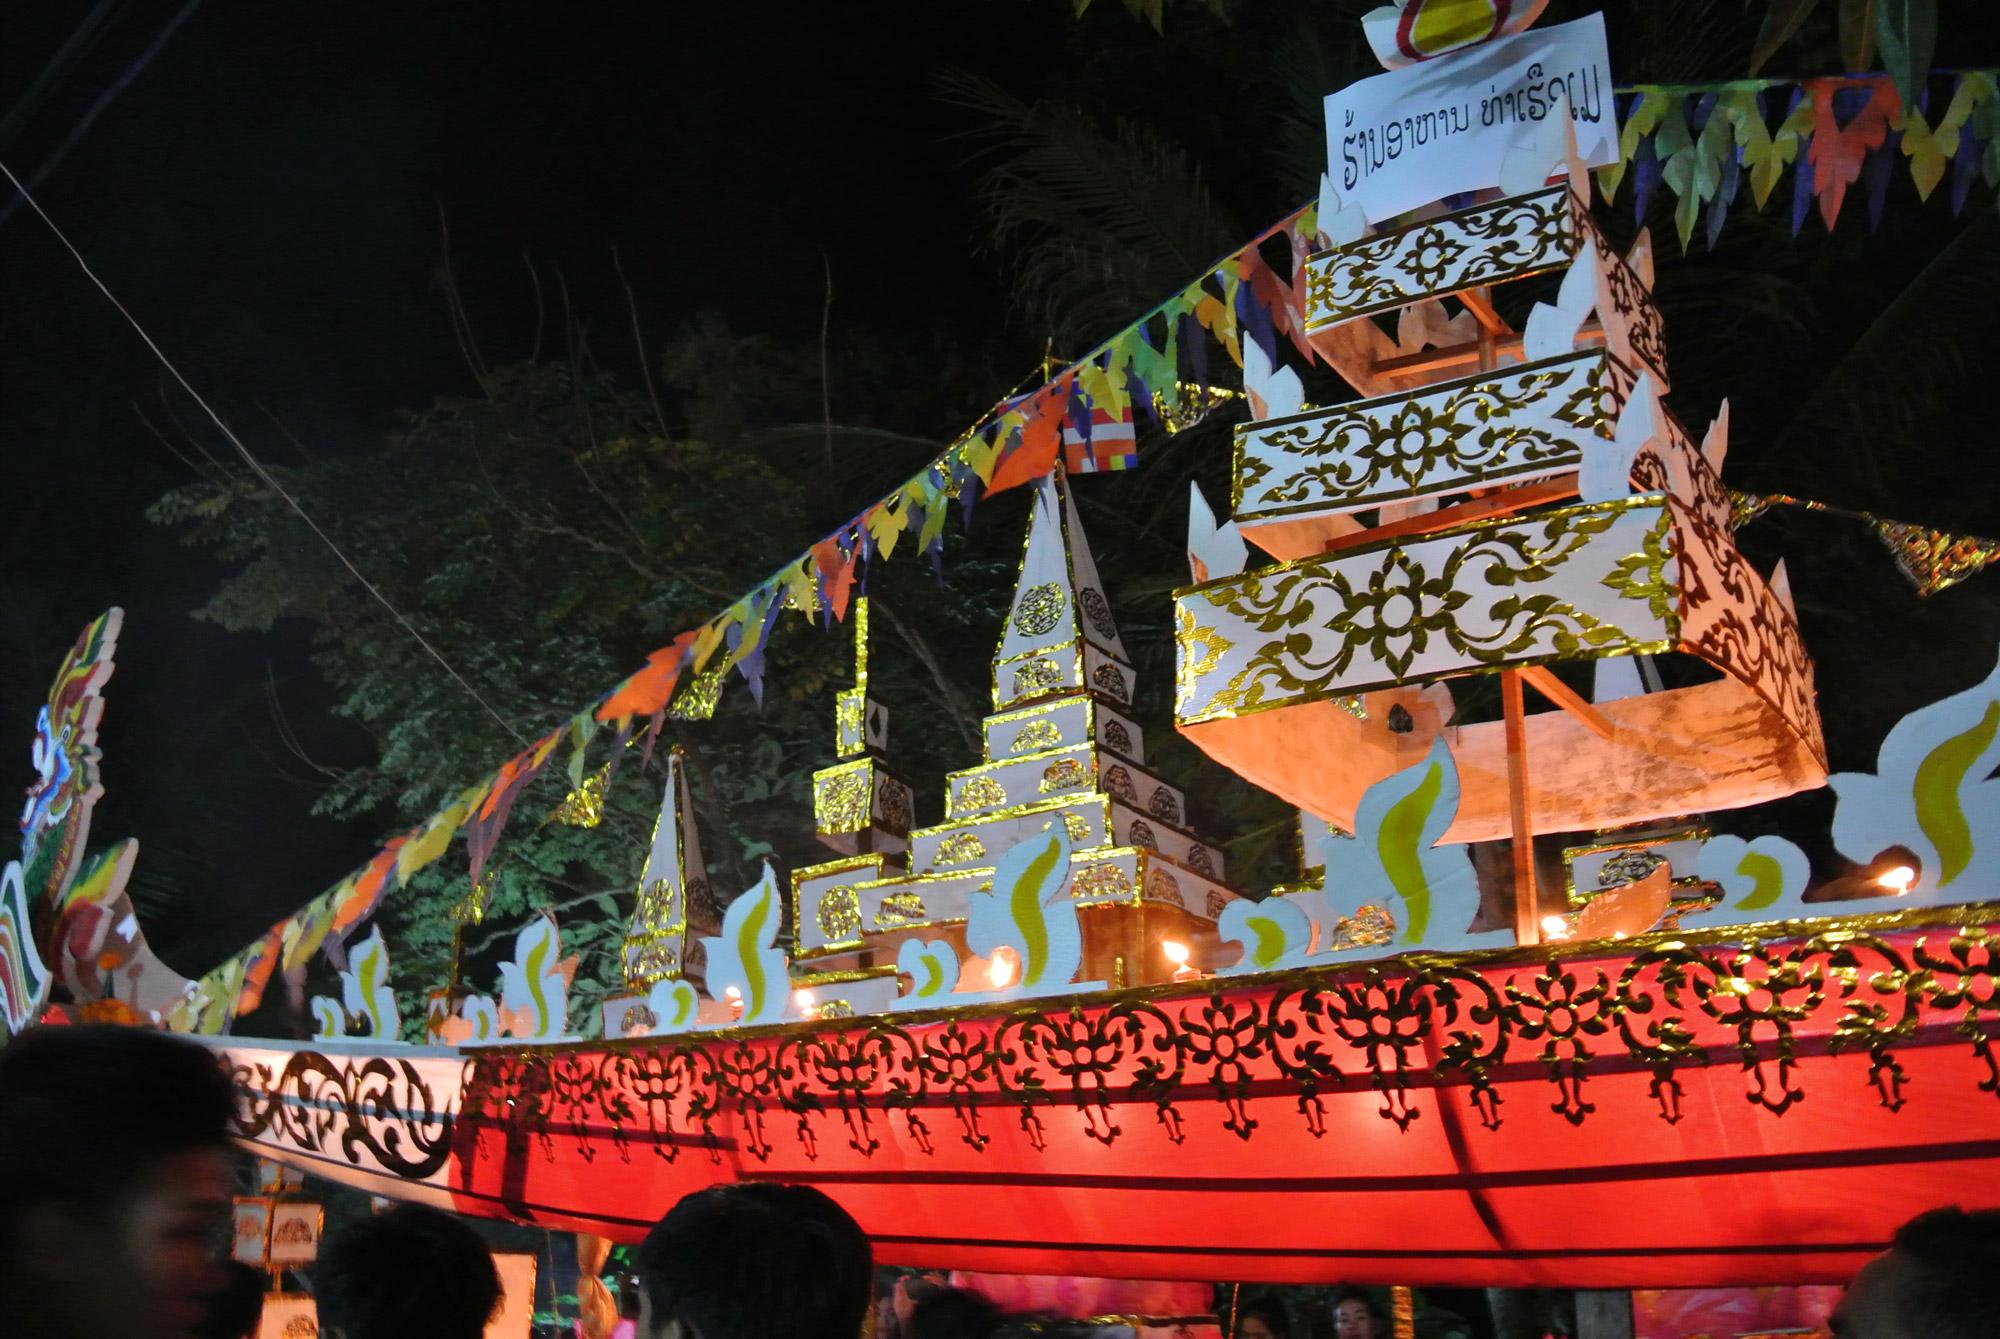 Anouk - Lichtfestival in Laos